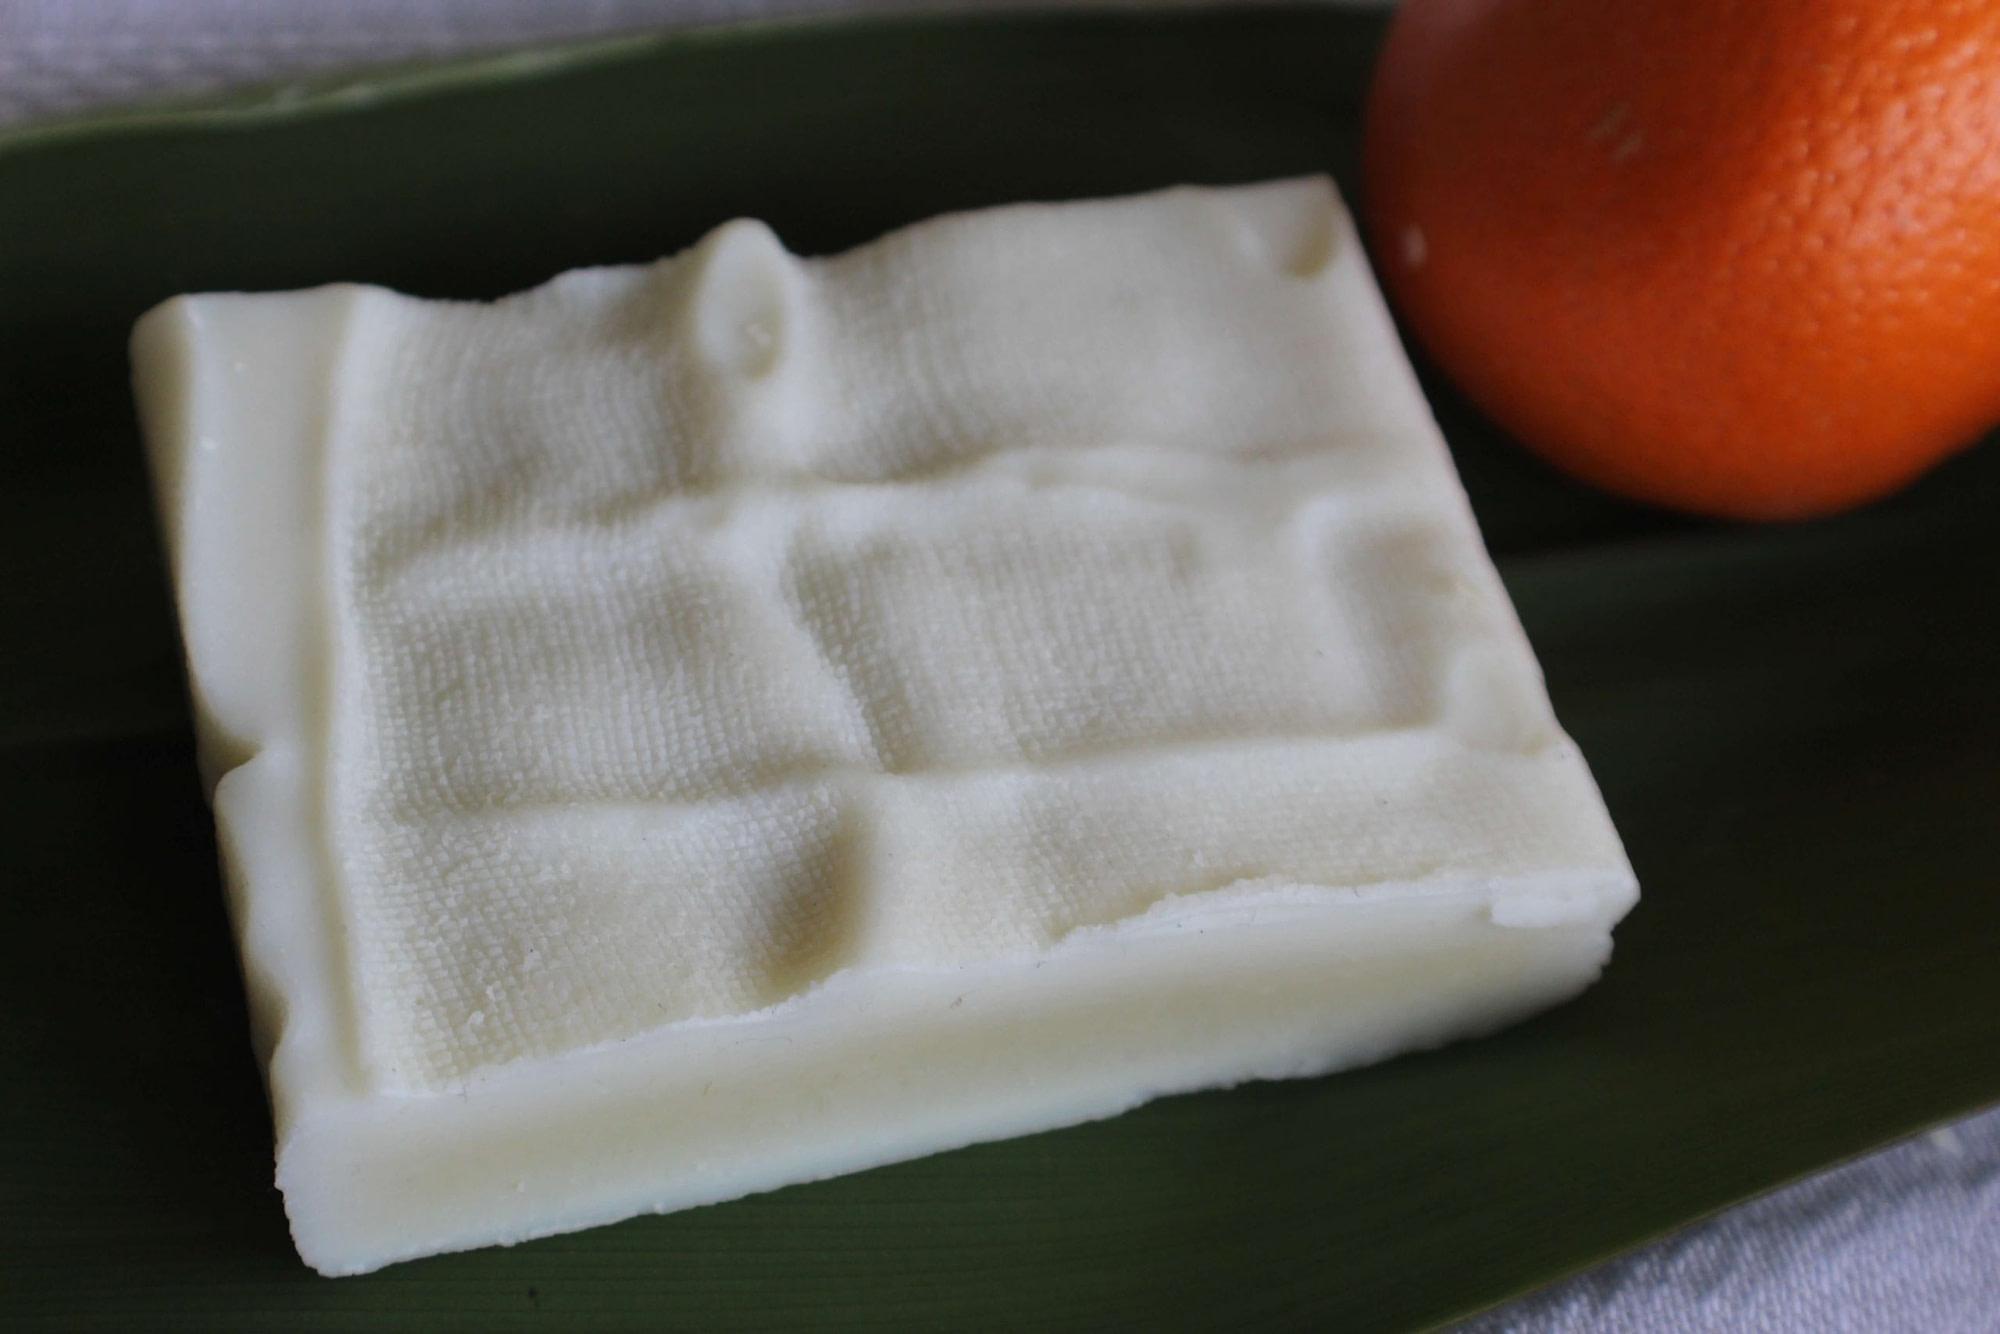 Neroli Orange Blossom Organic Castile Soap - Handmade Soap in Georgia